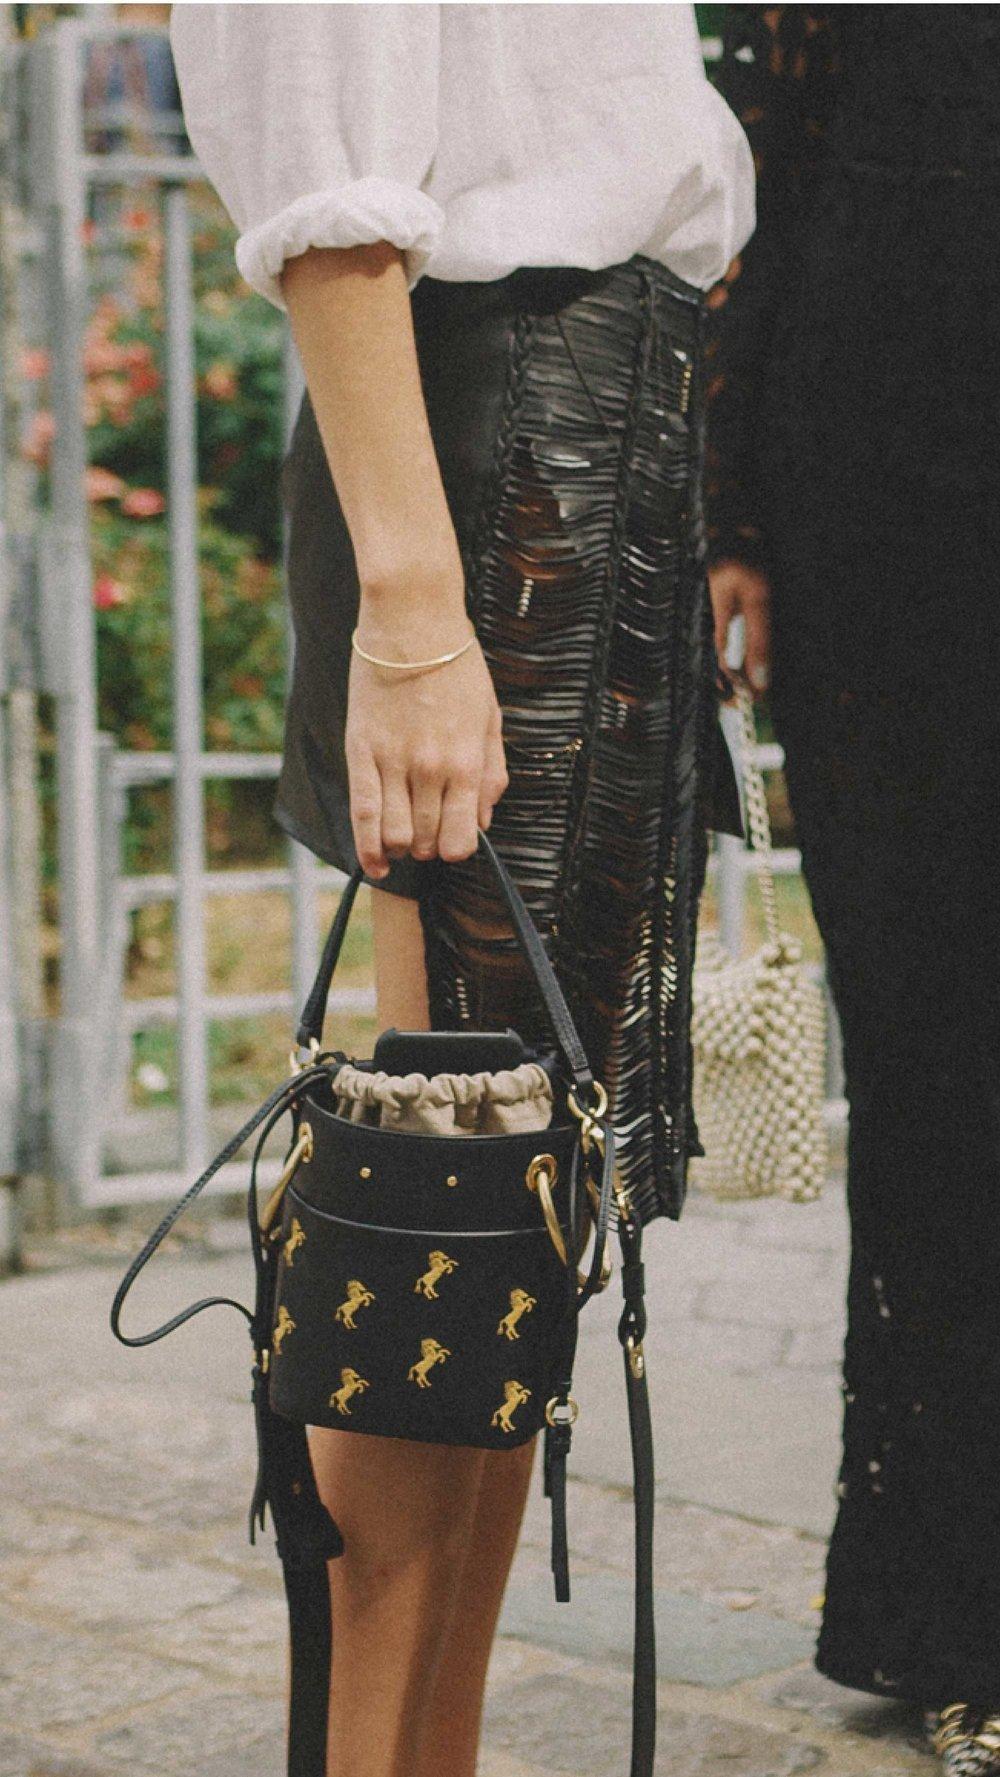 12 Best Chloe bags of Fashion Week -  CHLOe Roy mini leather bucket bag and Chloe Small Tess Leather Shoulder Bag9.jpg